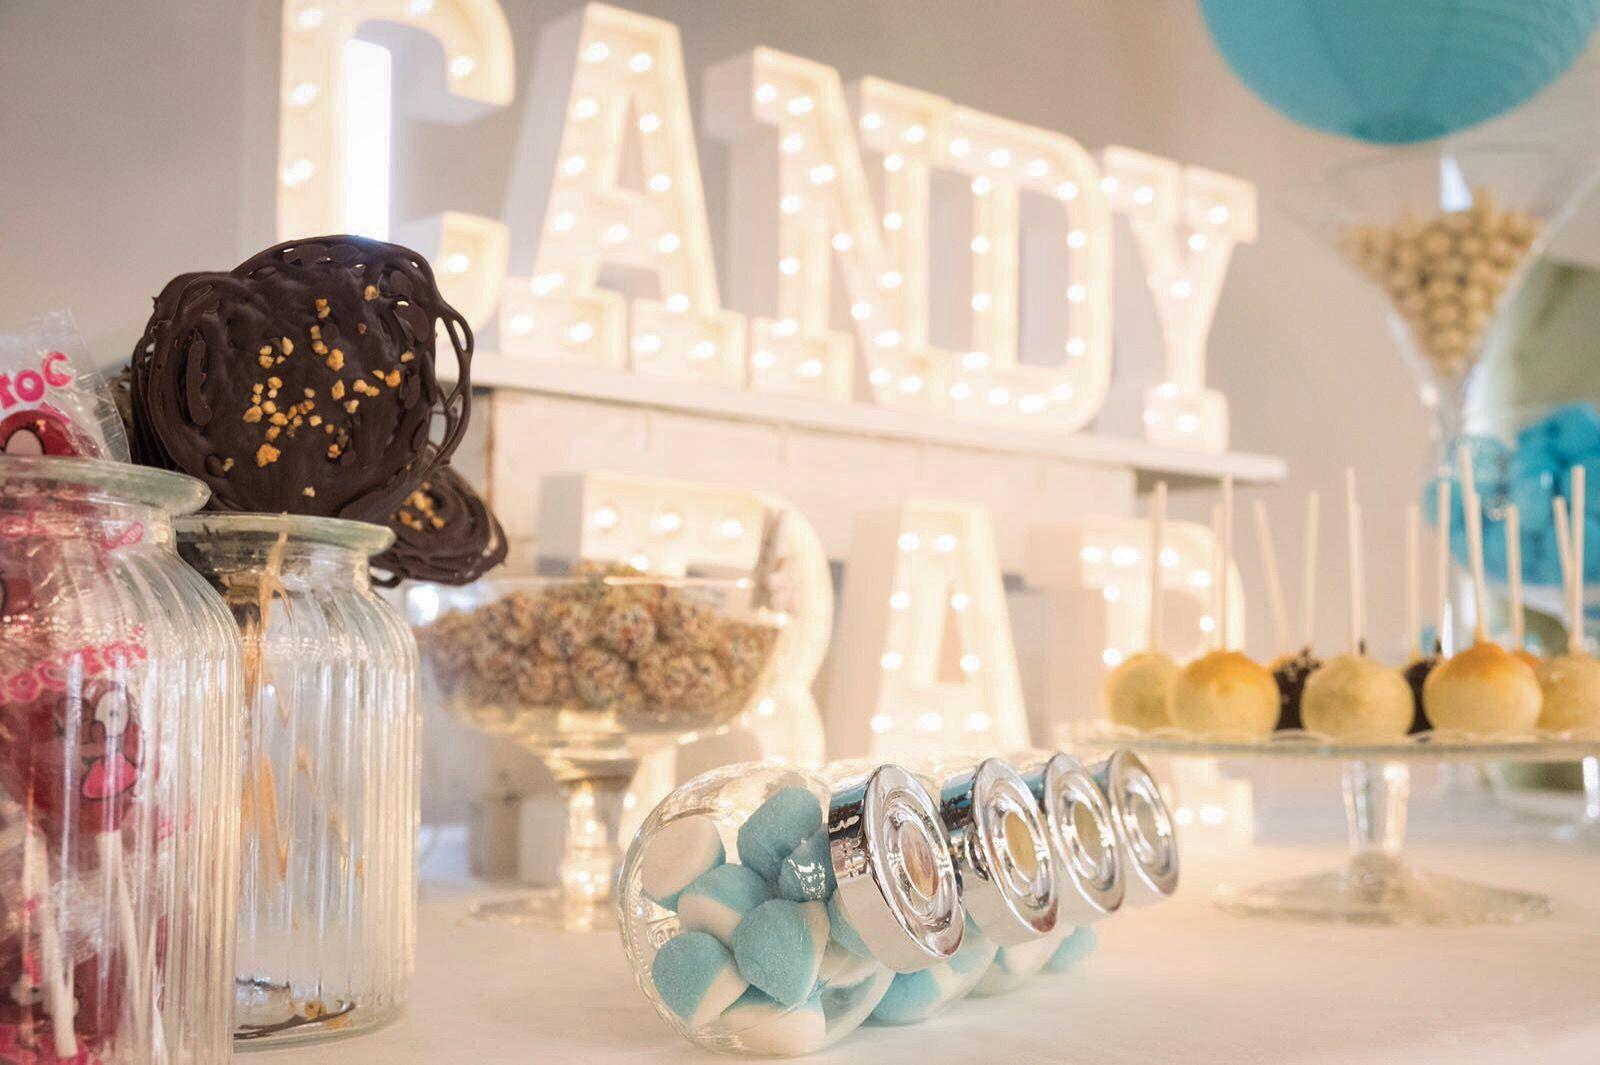 Vamos a empezar el miércoles de una manera requetedulce🍬🍭🍫🍦🍰🍪  Hoy nos toca maratón en #eltallerLOVE, para seguir ultimando toda la decoración de la #bodaLOVE de A+S.  Queremos contar tu historia de amor, ¡escríbenos! +info: hola@lovebodasyeventos.com  LOVE #love #amor #inspiracion #inlove #handmade #design #destinationwedding #work #wedding #weddingday #weddingplanner #weddingideas #candybar #light #chocolate #boda #bodegon #bodega #design #deco #decor #diseño #Cádiz #sweet #candy